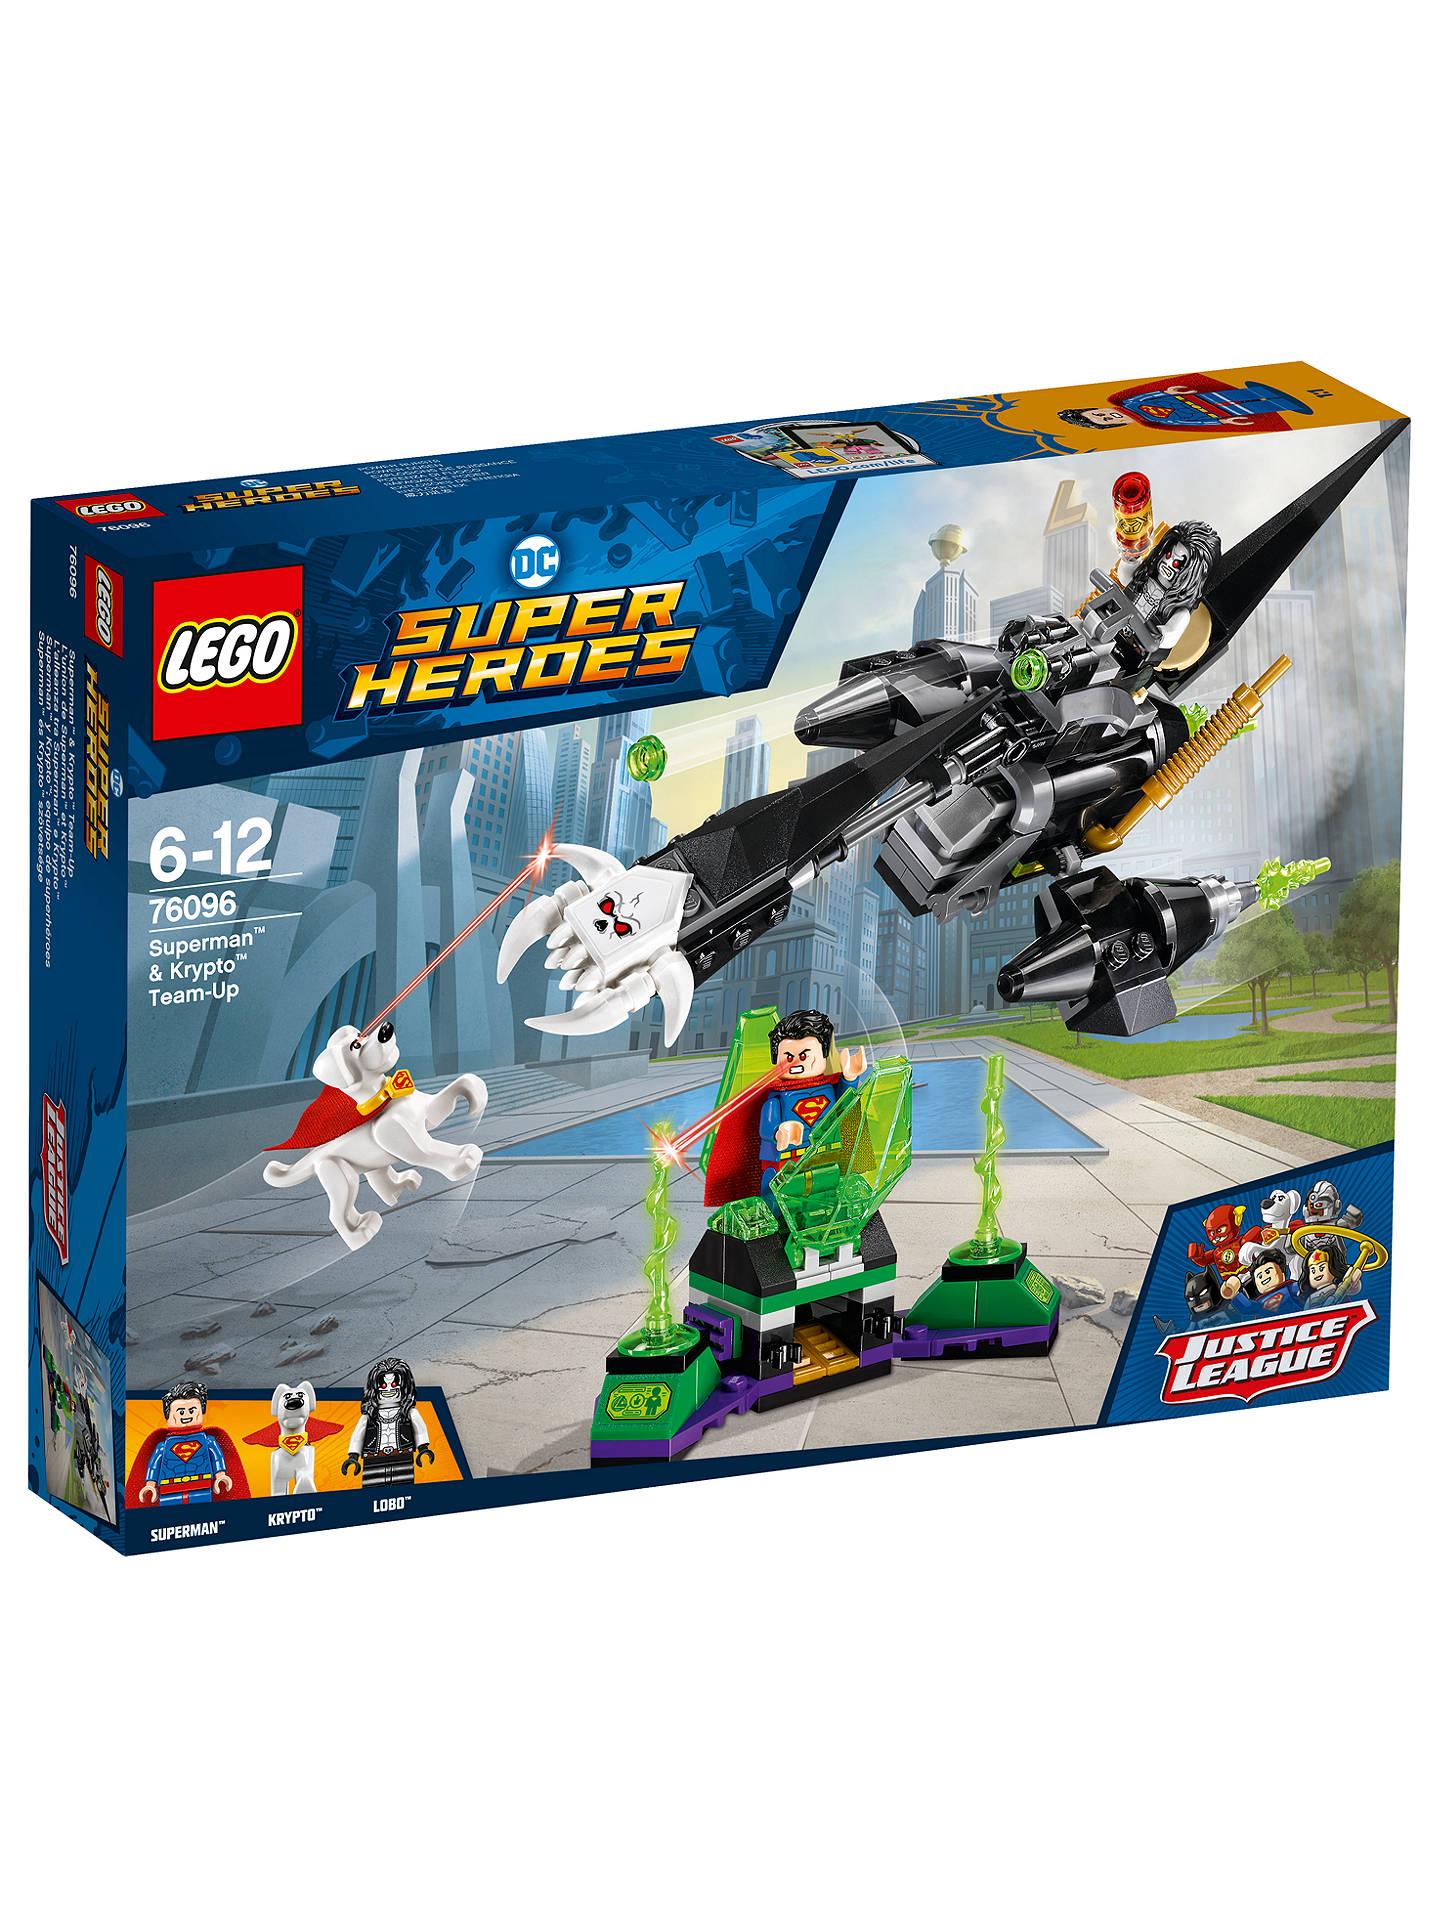 Lego Dc Super Heroes 79096 Superman Krypto Team Up At John Lewis